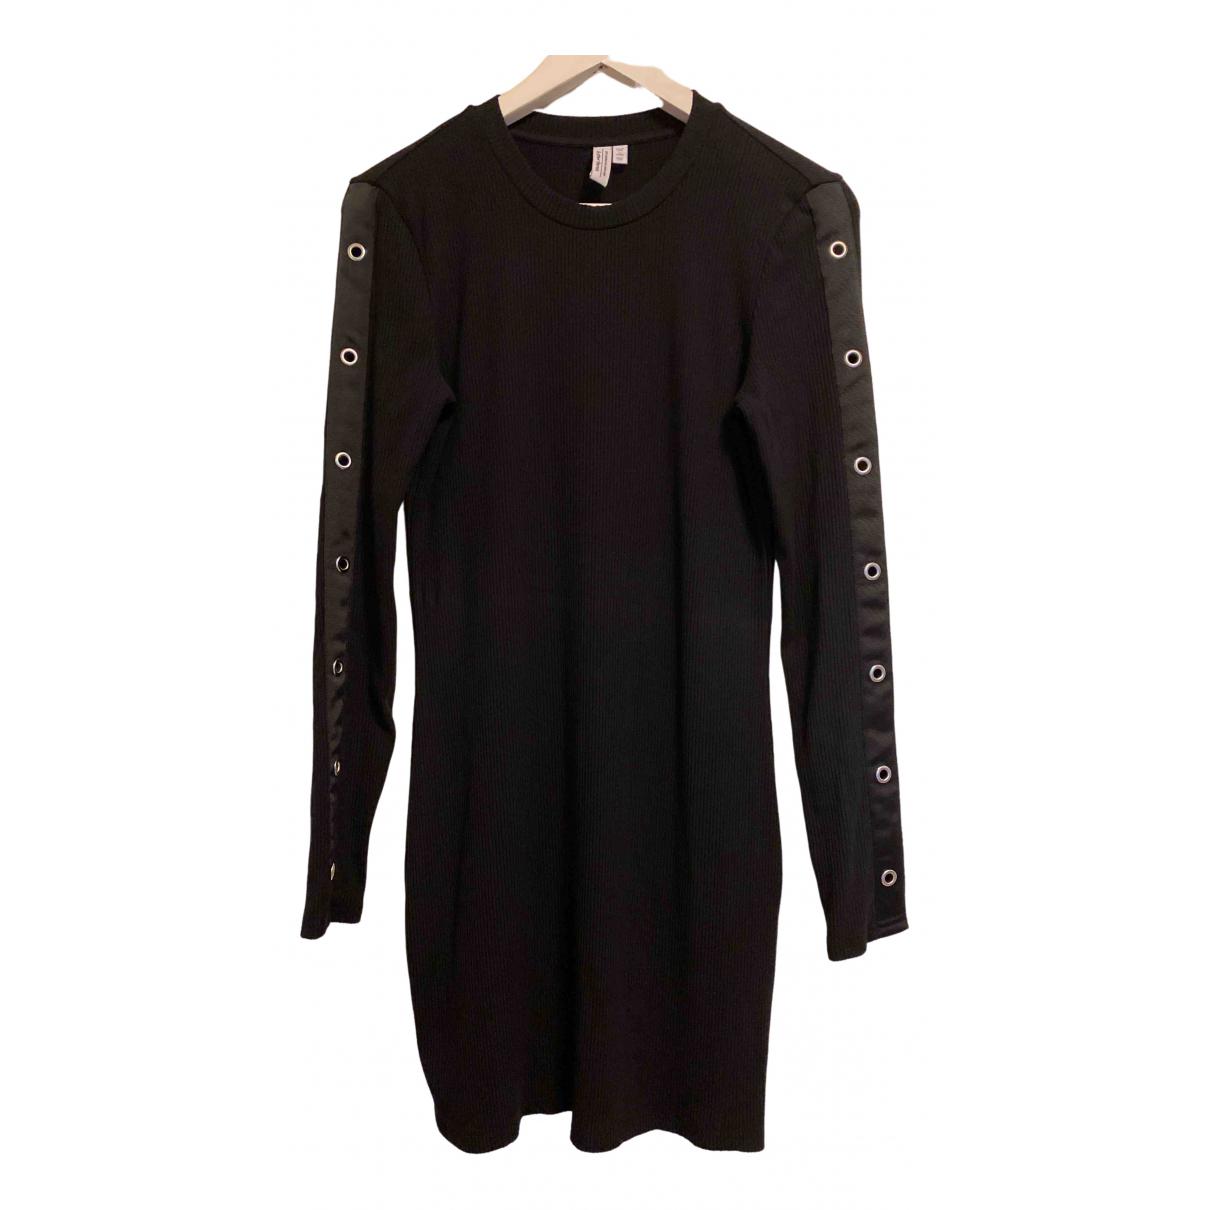 & Other Stories - Robe   pour femme en coton - elasthane - noir